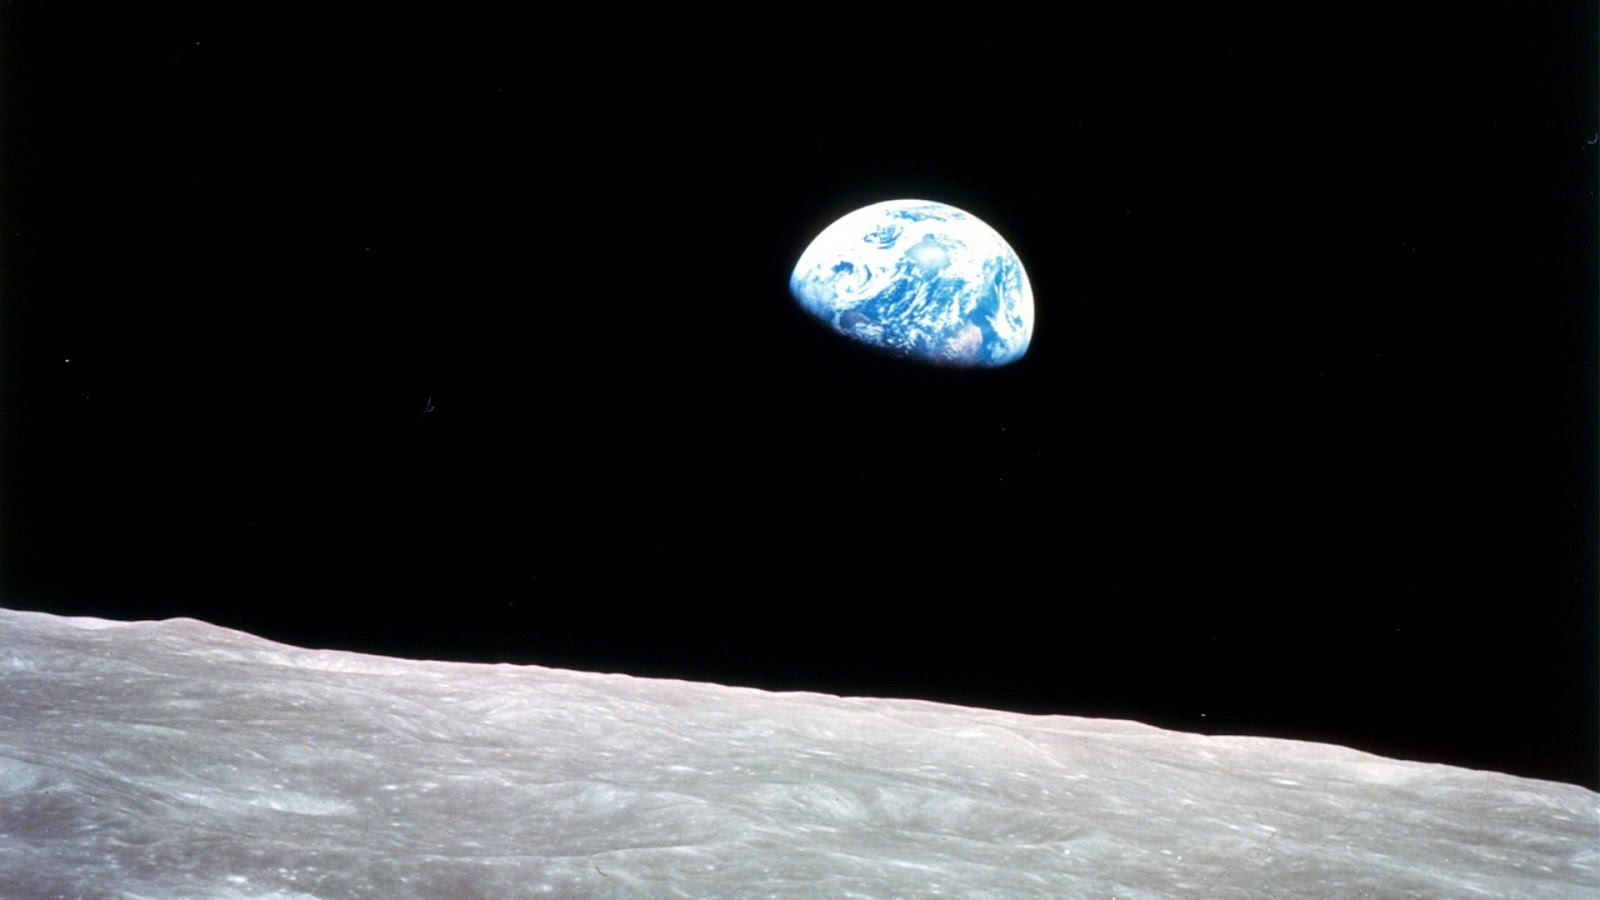 48+ Earth Wallpaper HD 1080p on WallpaperSafari